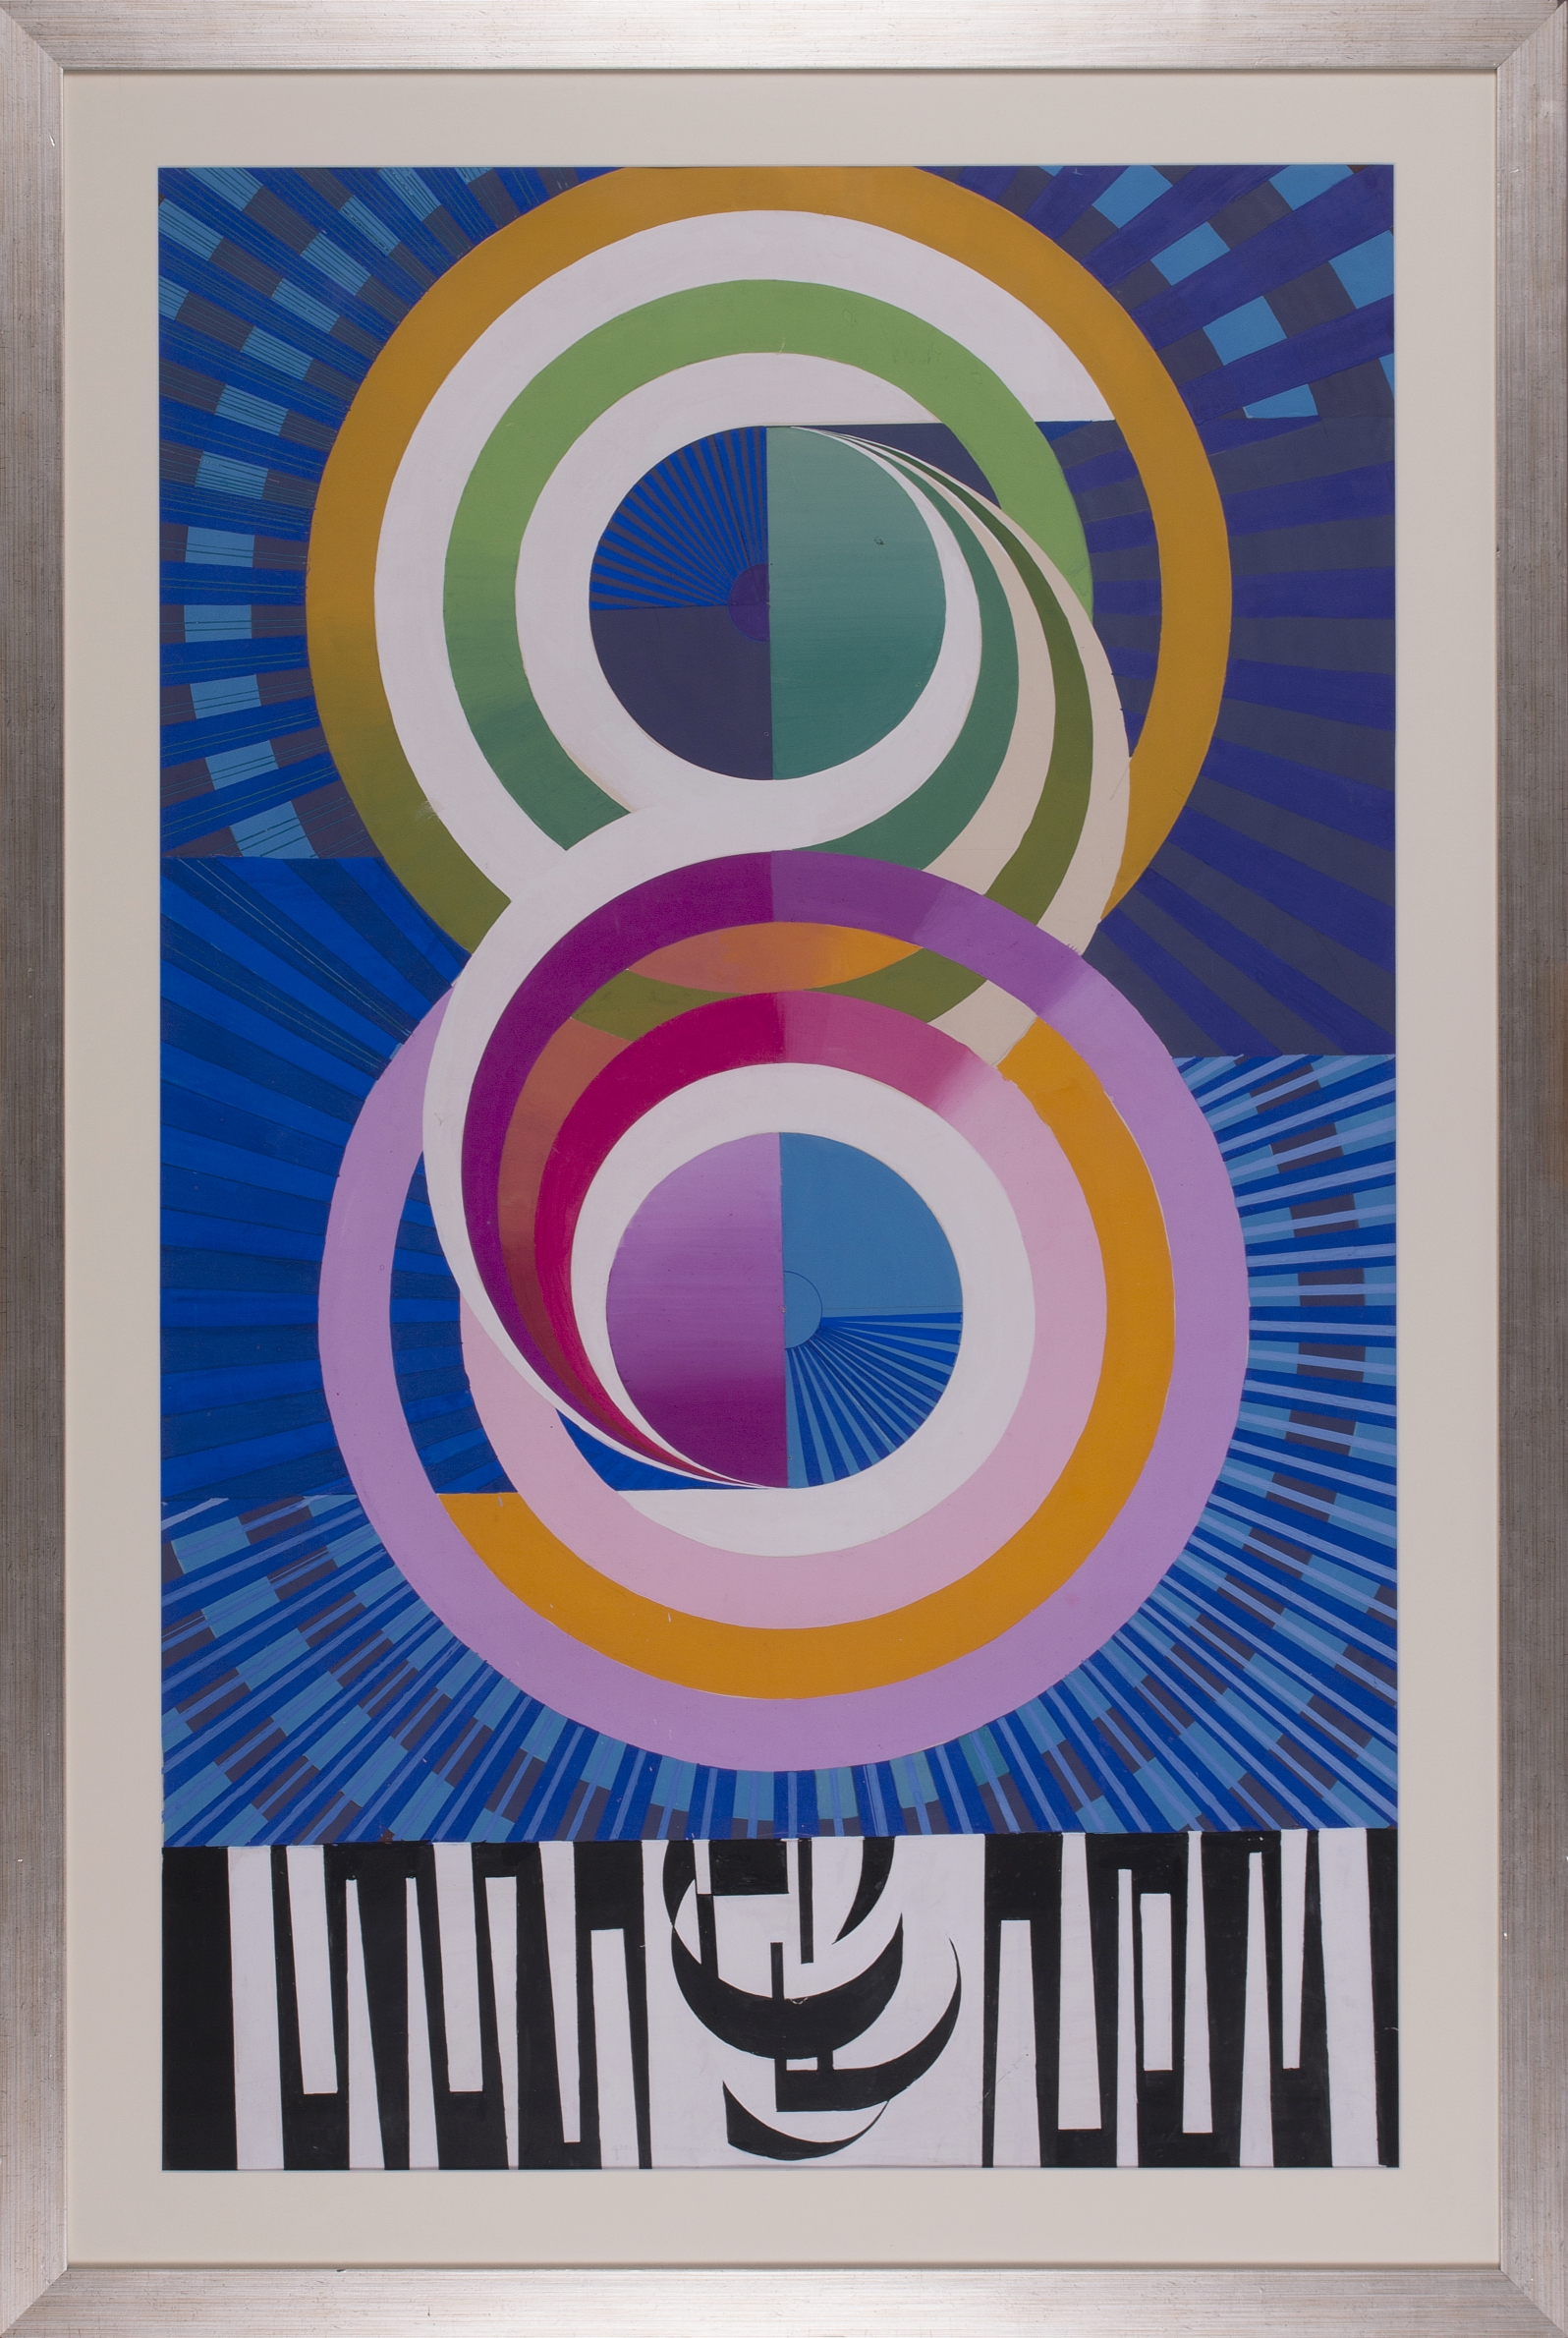 Gronowski Tadeusz (1894-1990),   Perpetuum, 1969